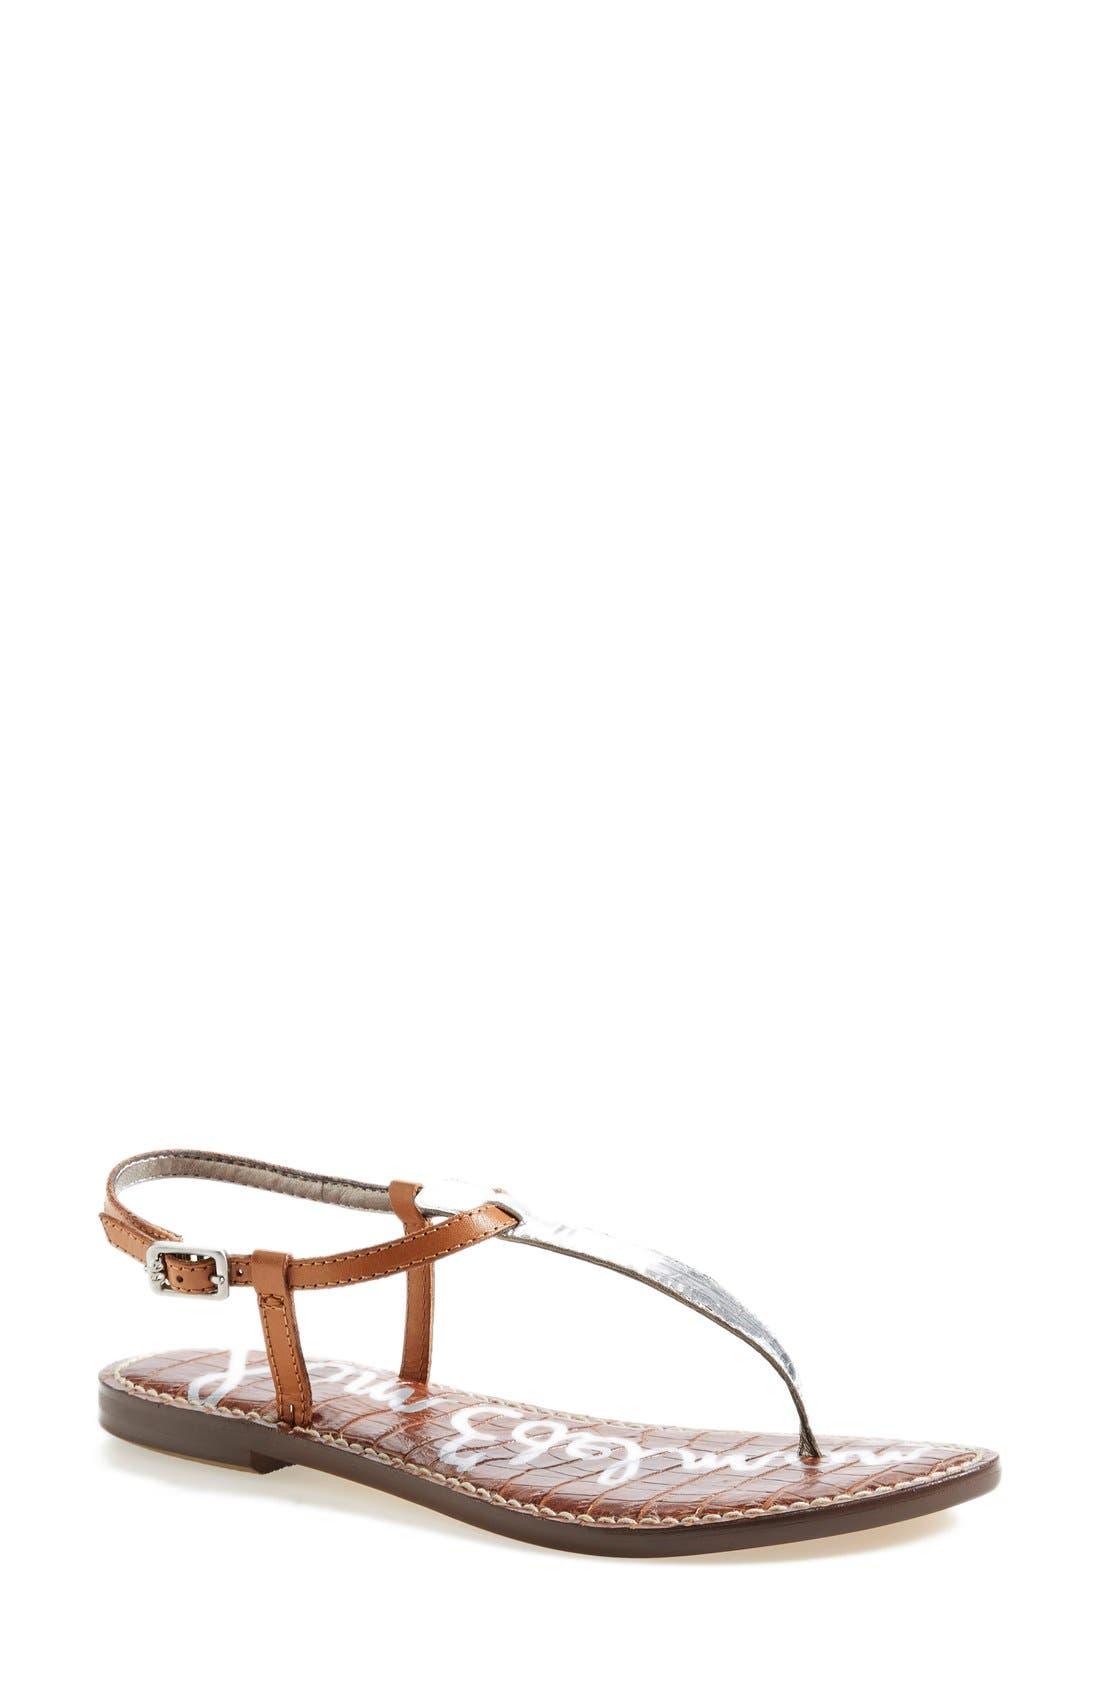 'Gigi' Leather Sandal,                         Main,                         color, 045